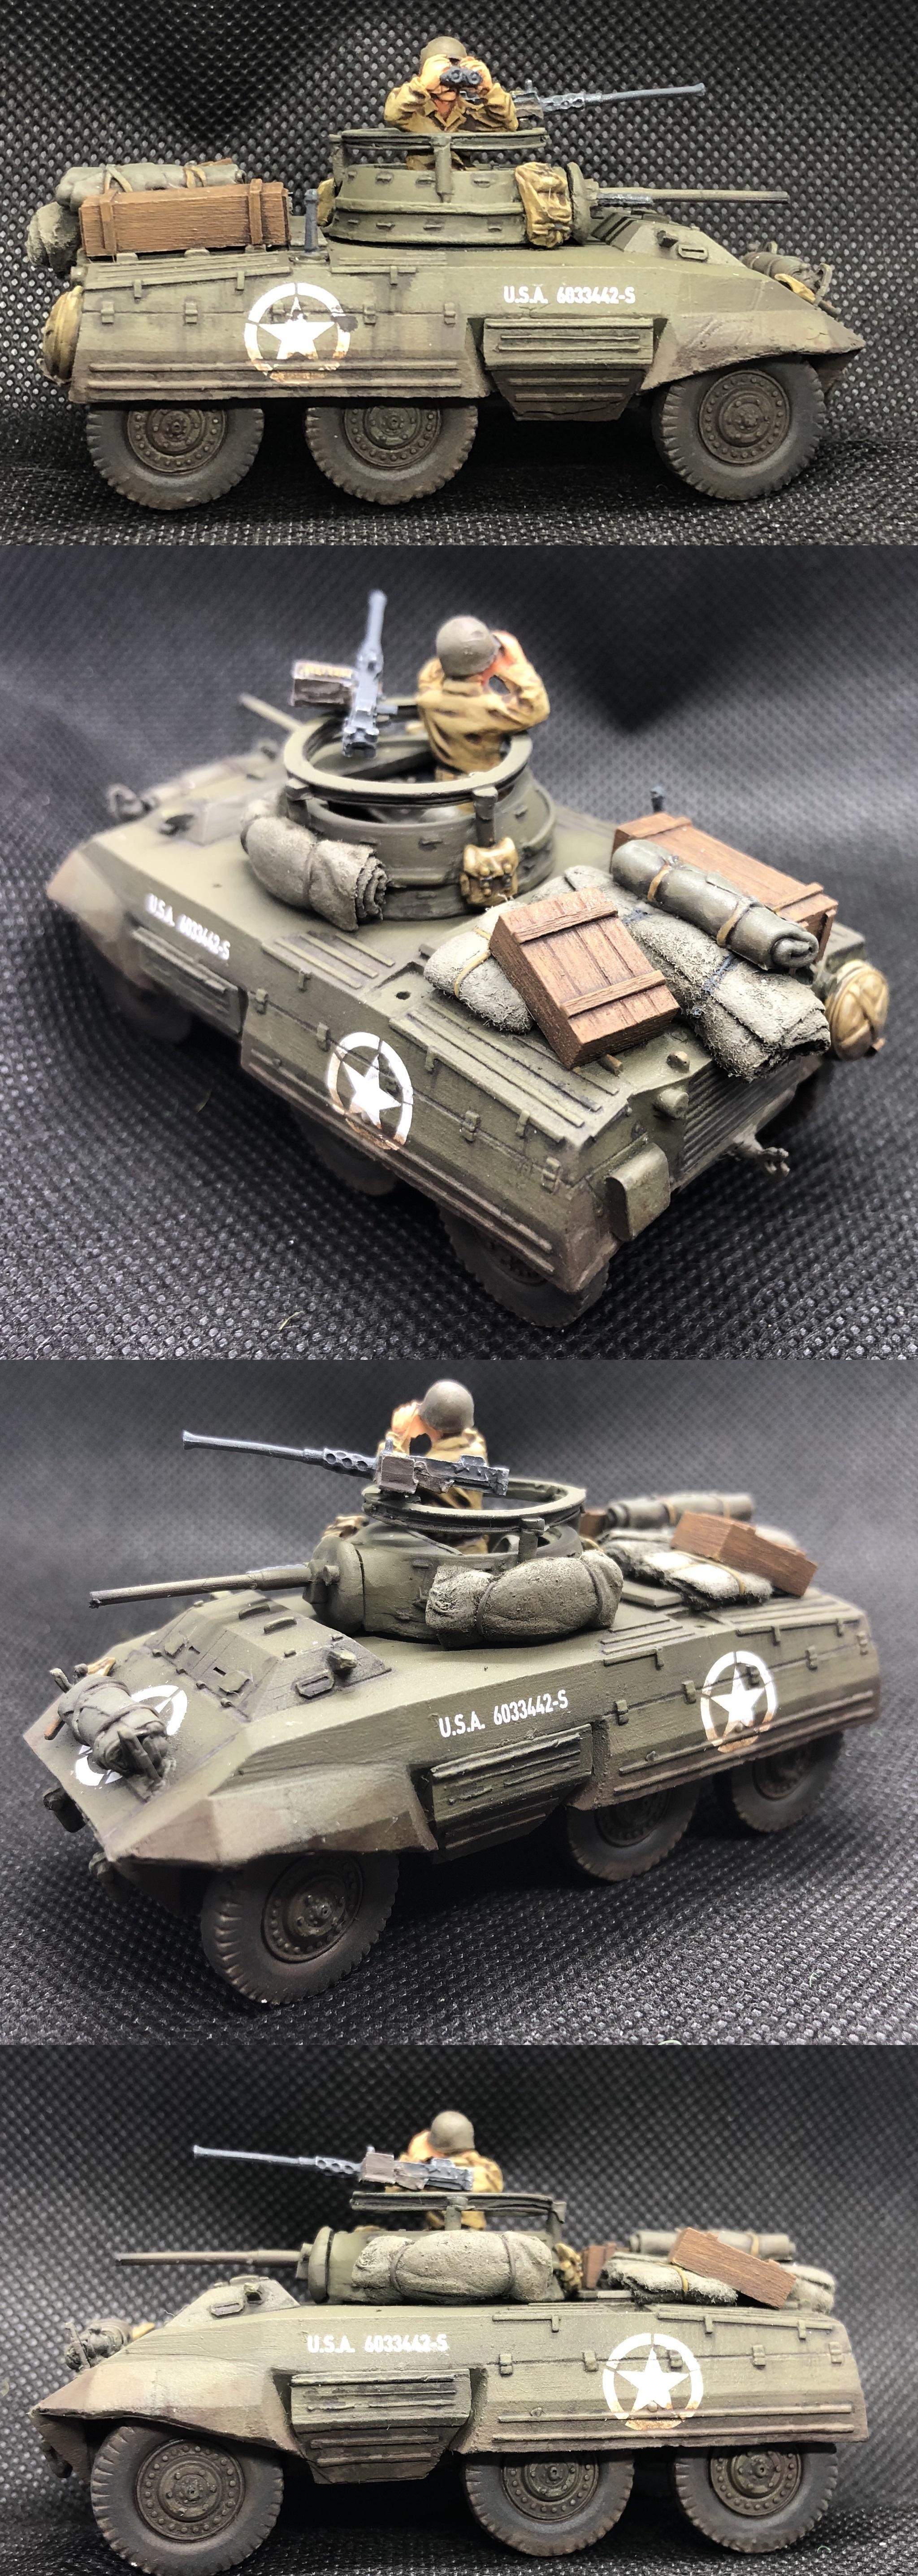 Bolt Action, Greyhound, Us, World War 2